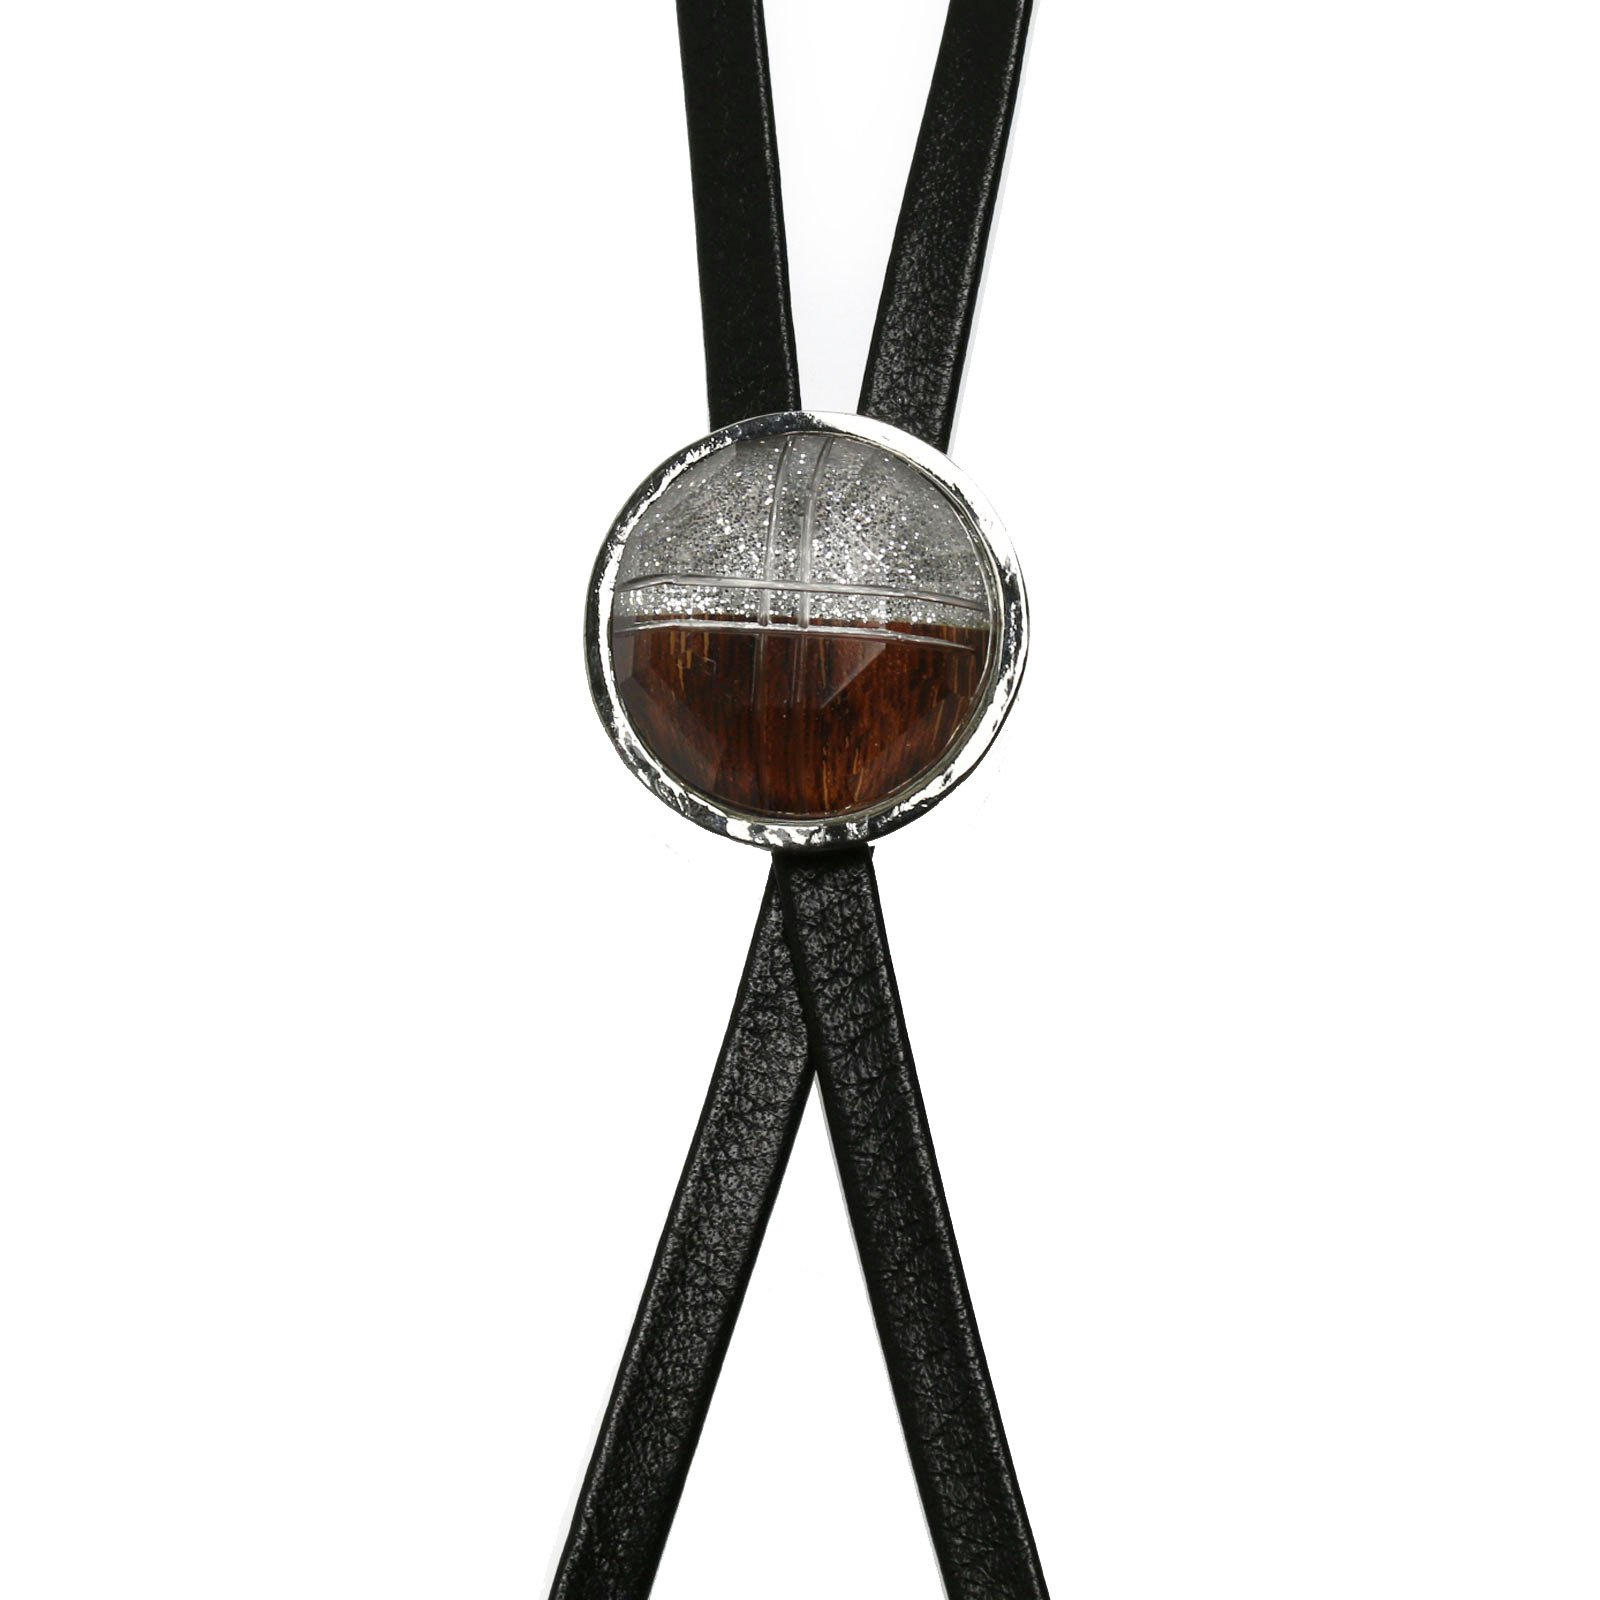 Tamarusan Bolo Tie Silver Lame Wood Leather Straps Nickel-Free Male Cross